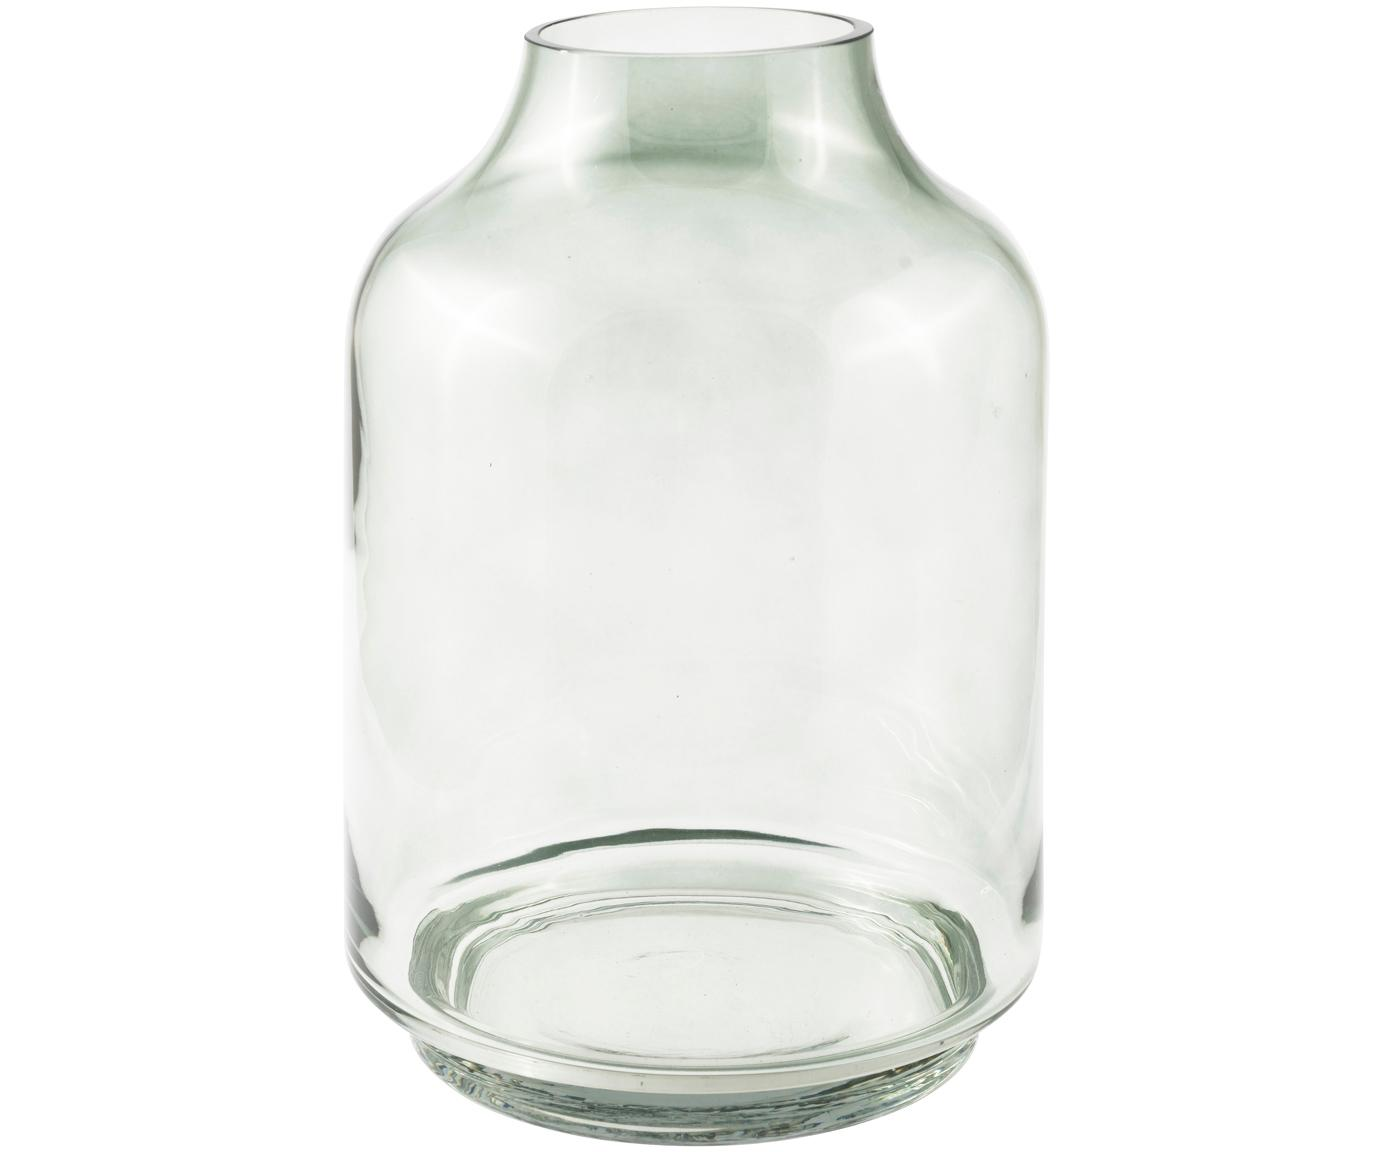 Glas-Vase Vibeke, Glas, Unten: Transparent mit FarbverlaufOben: Grün, transparent, Ø 17 x H 26 cm